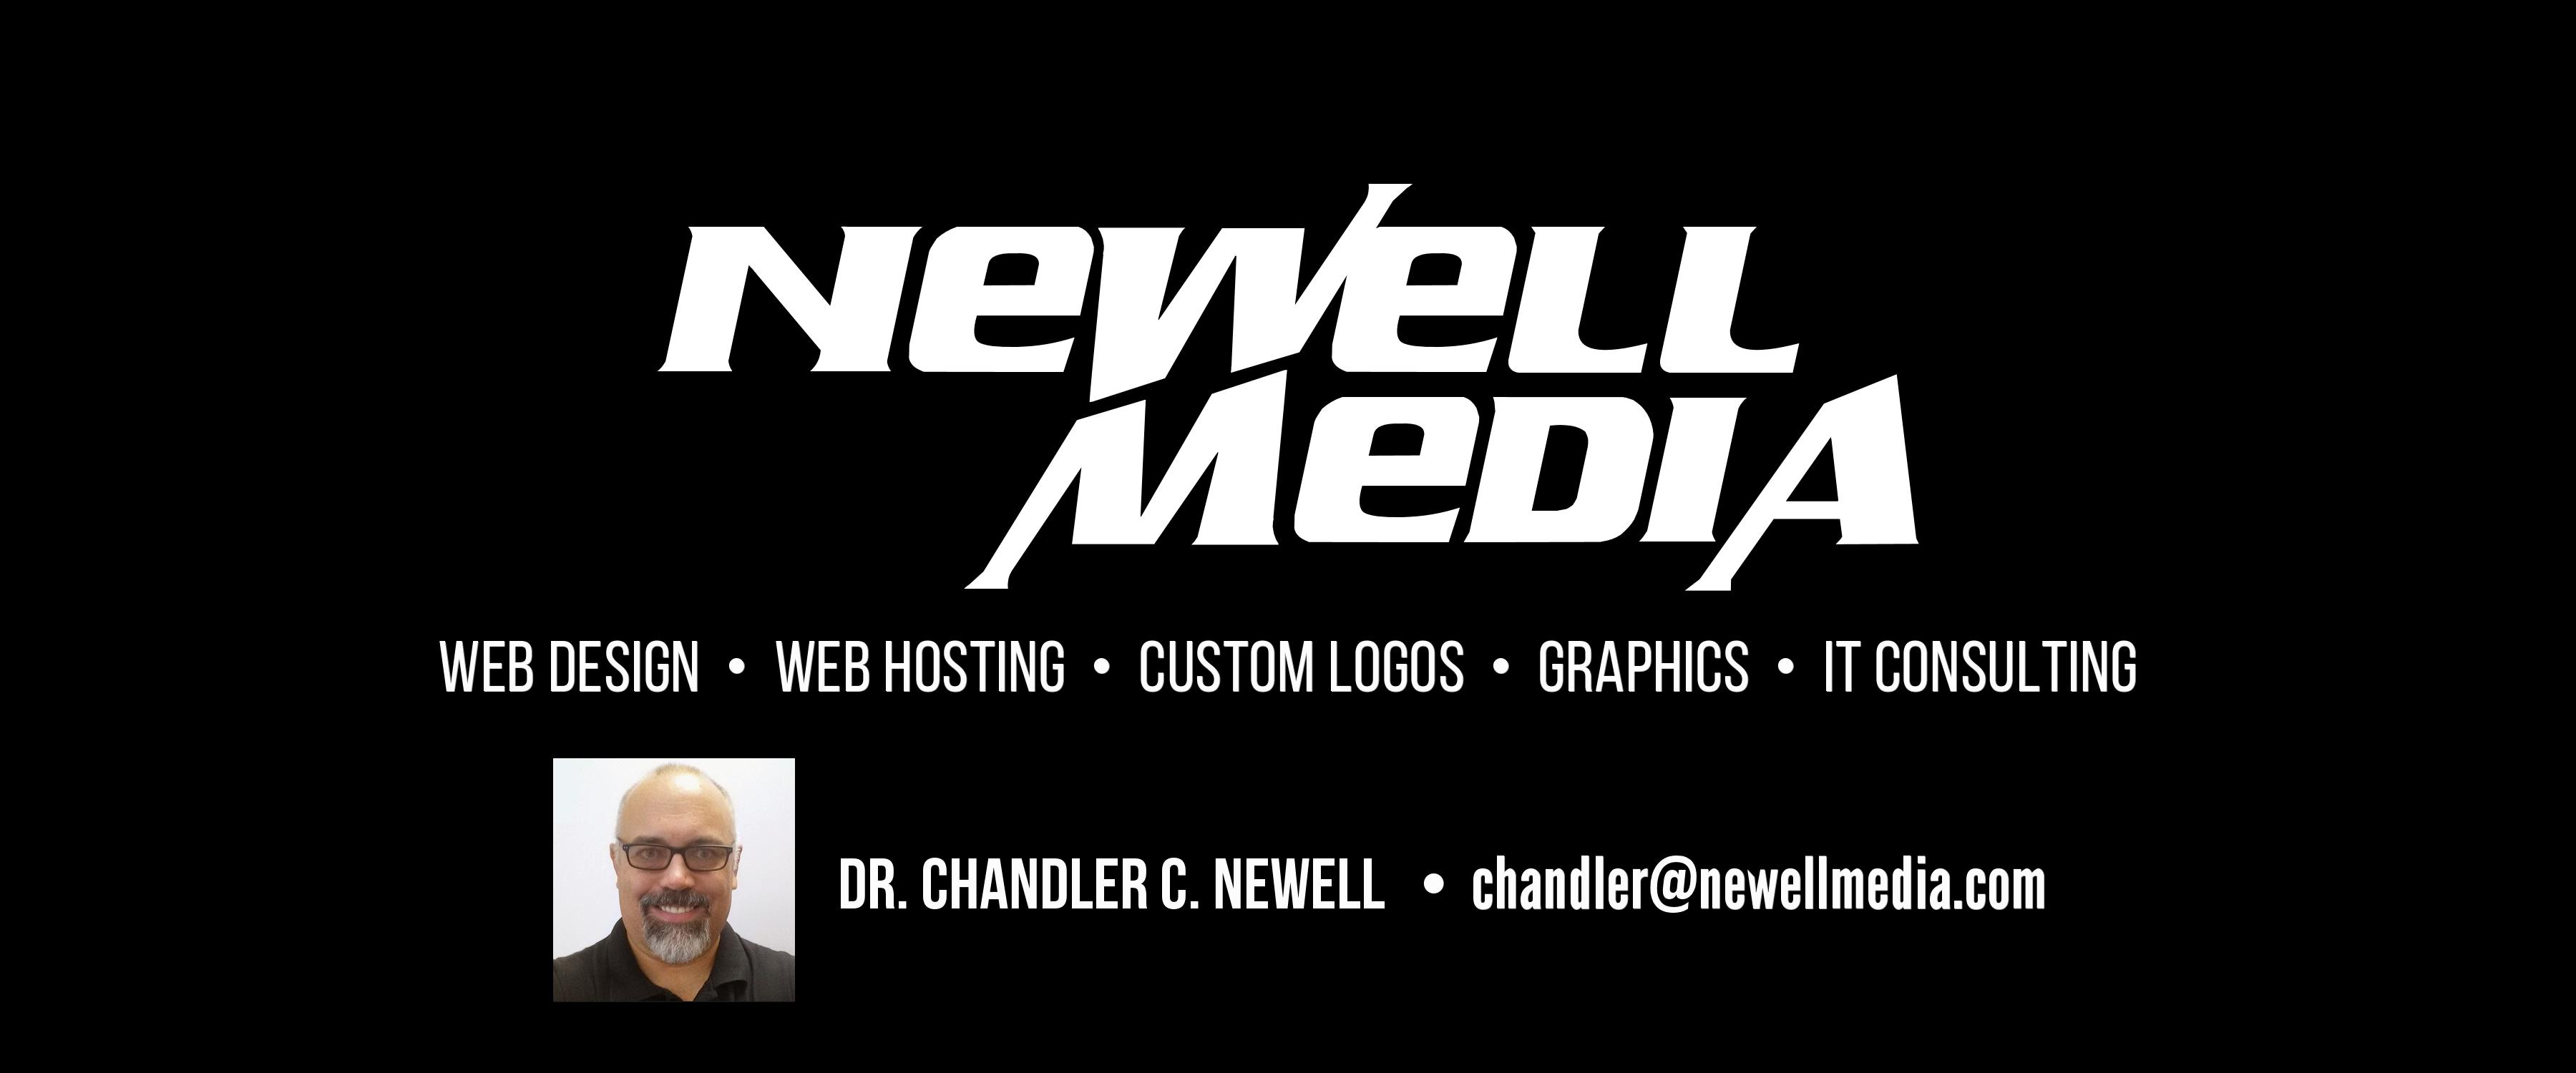 Newell Media Headear